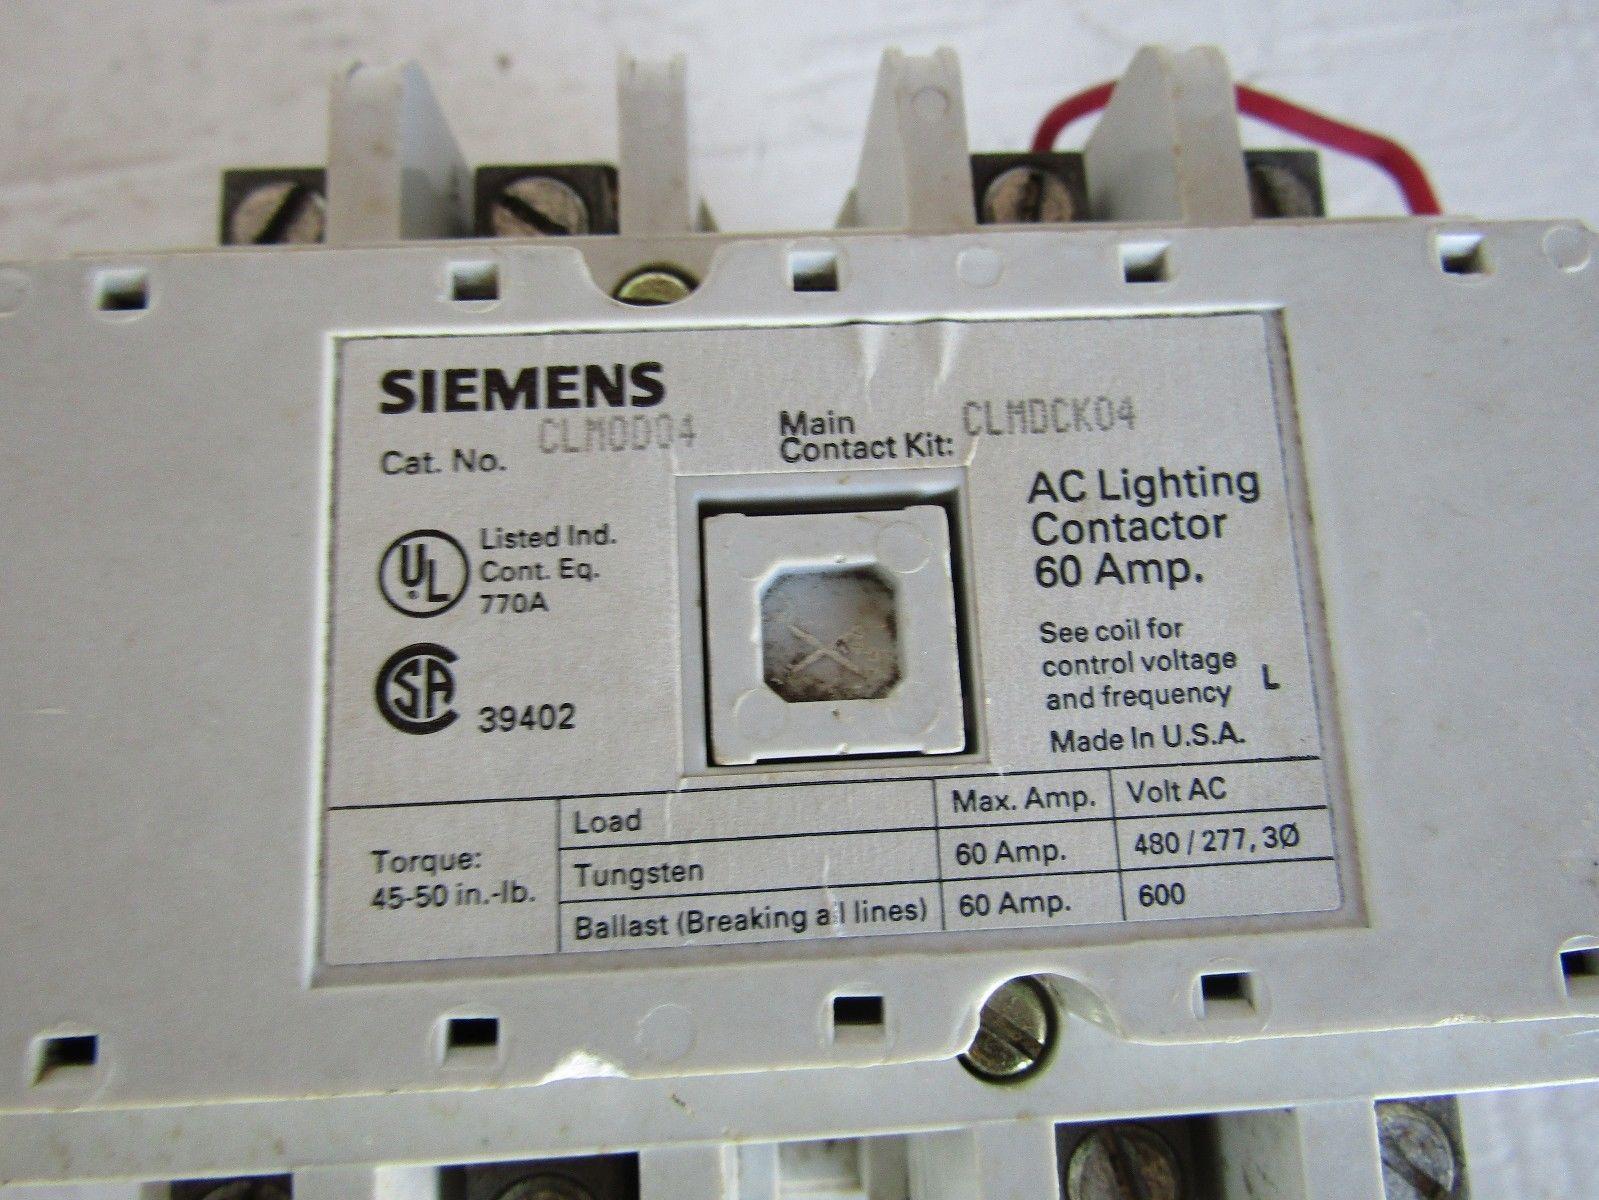 Siemens lighting contactor wiring diagram new wiring diagram 2018 lighting contactor wiring diagram arrows examples of threats in wiring a siemens motor starter siemens motor wiring diagram soft starter wiring diagram on cheapraybanclubmaster Gallery